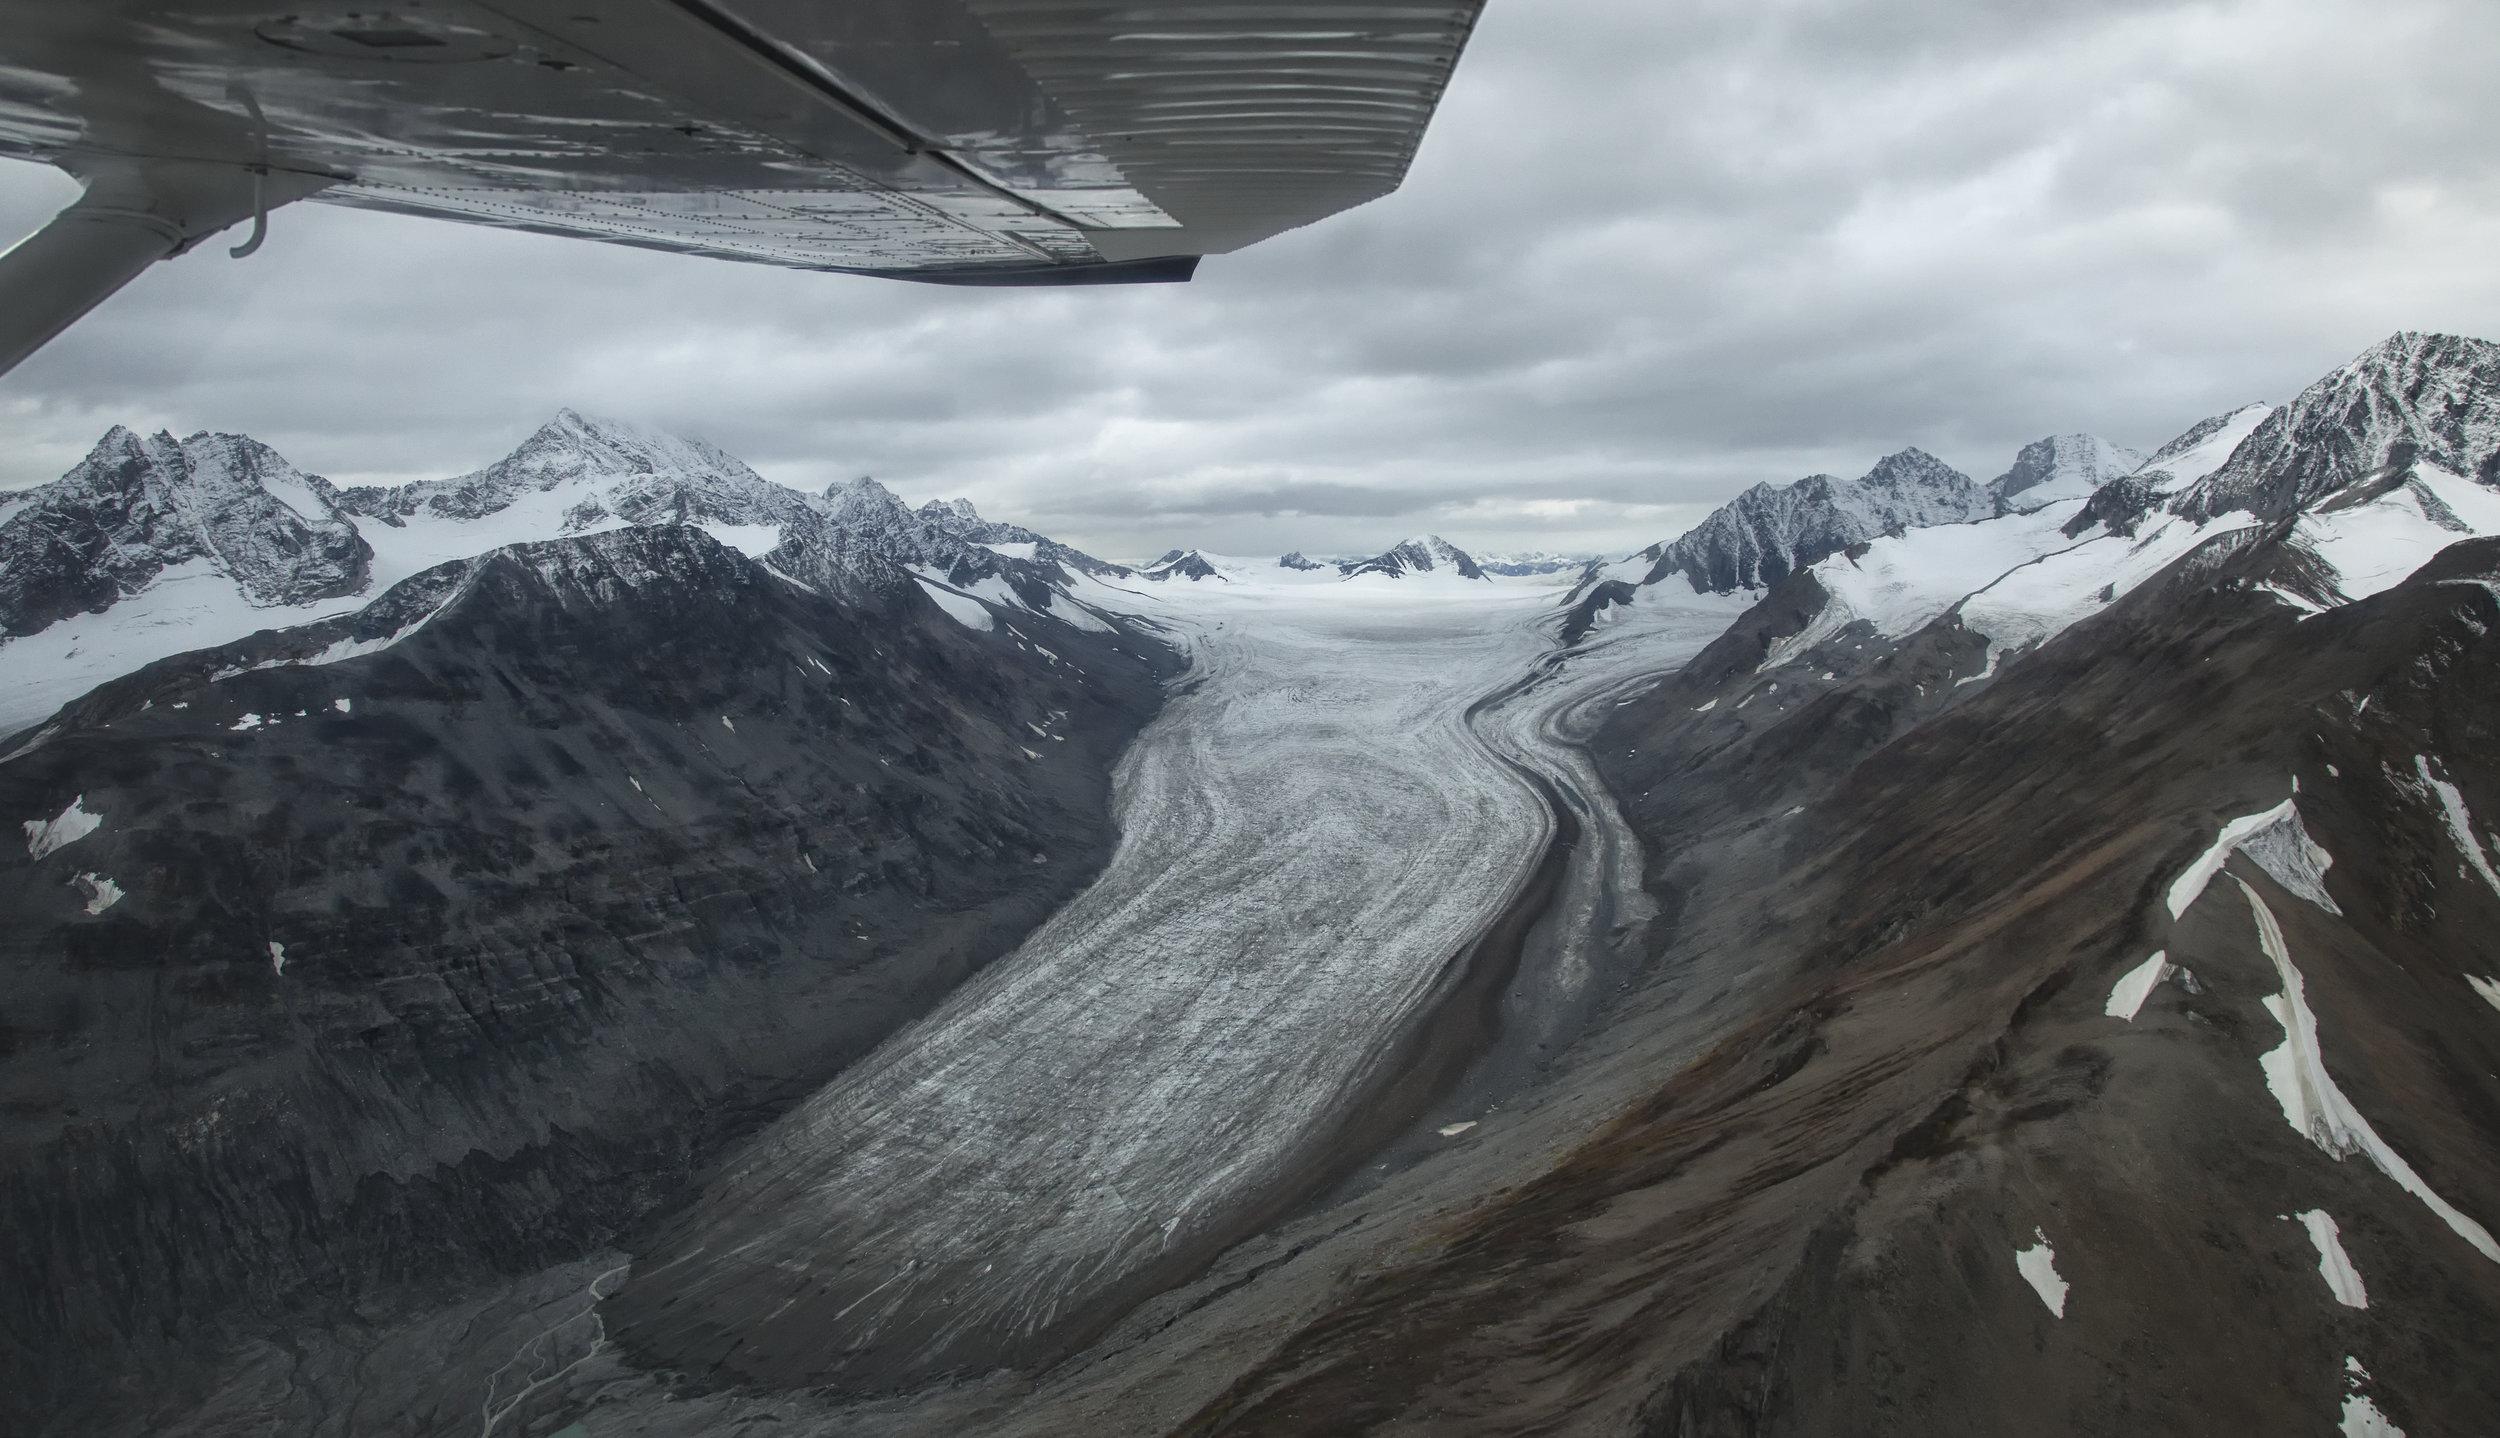 Yukon glacier - Across the Blue Planet